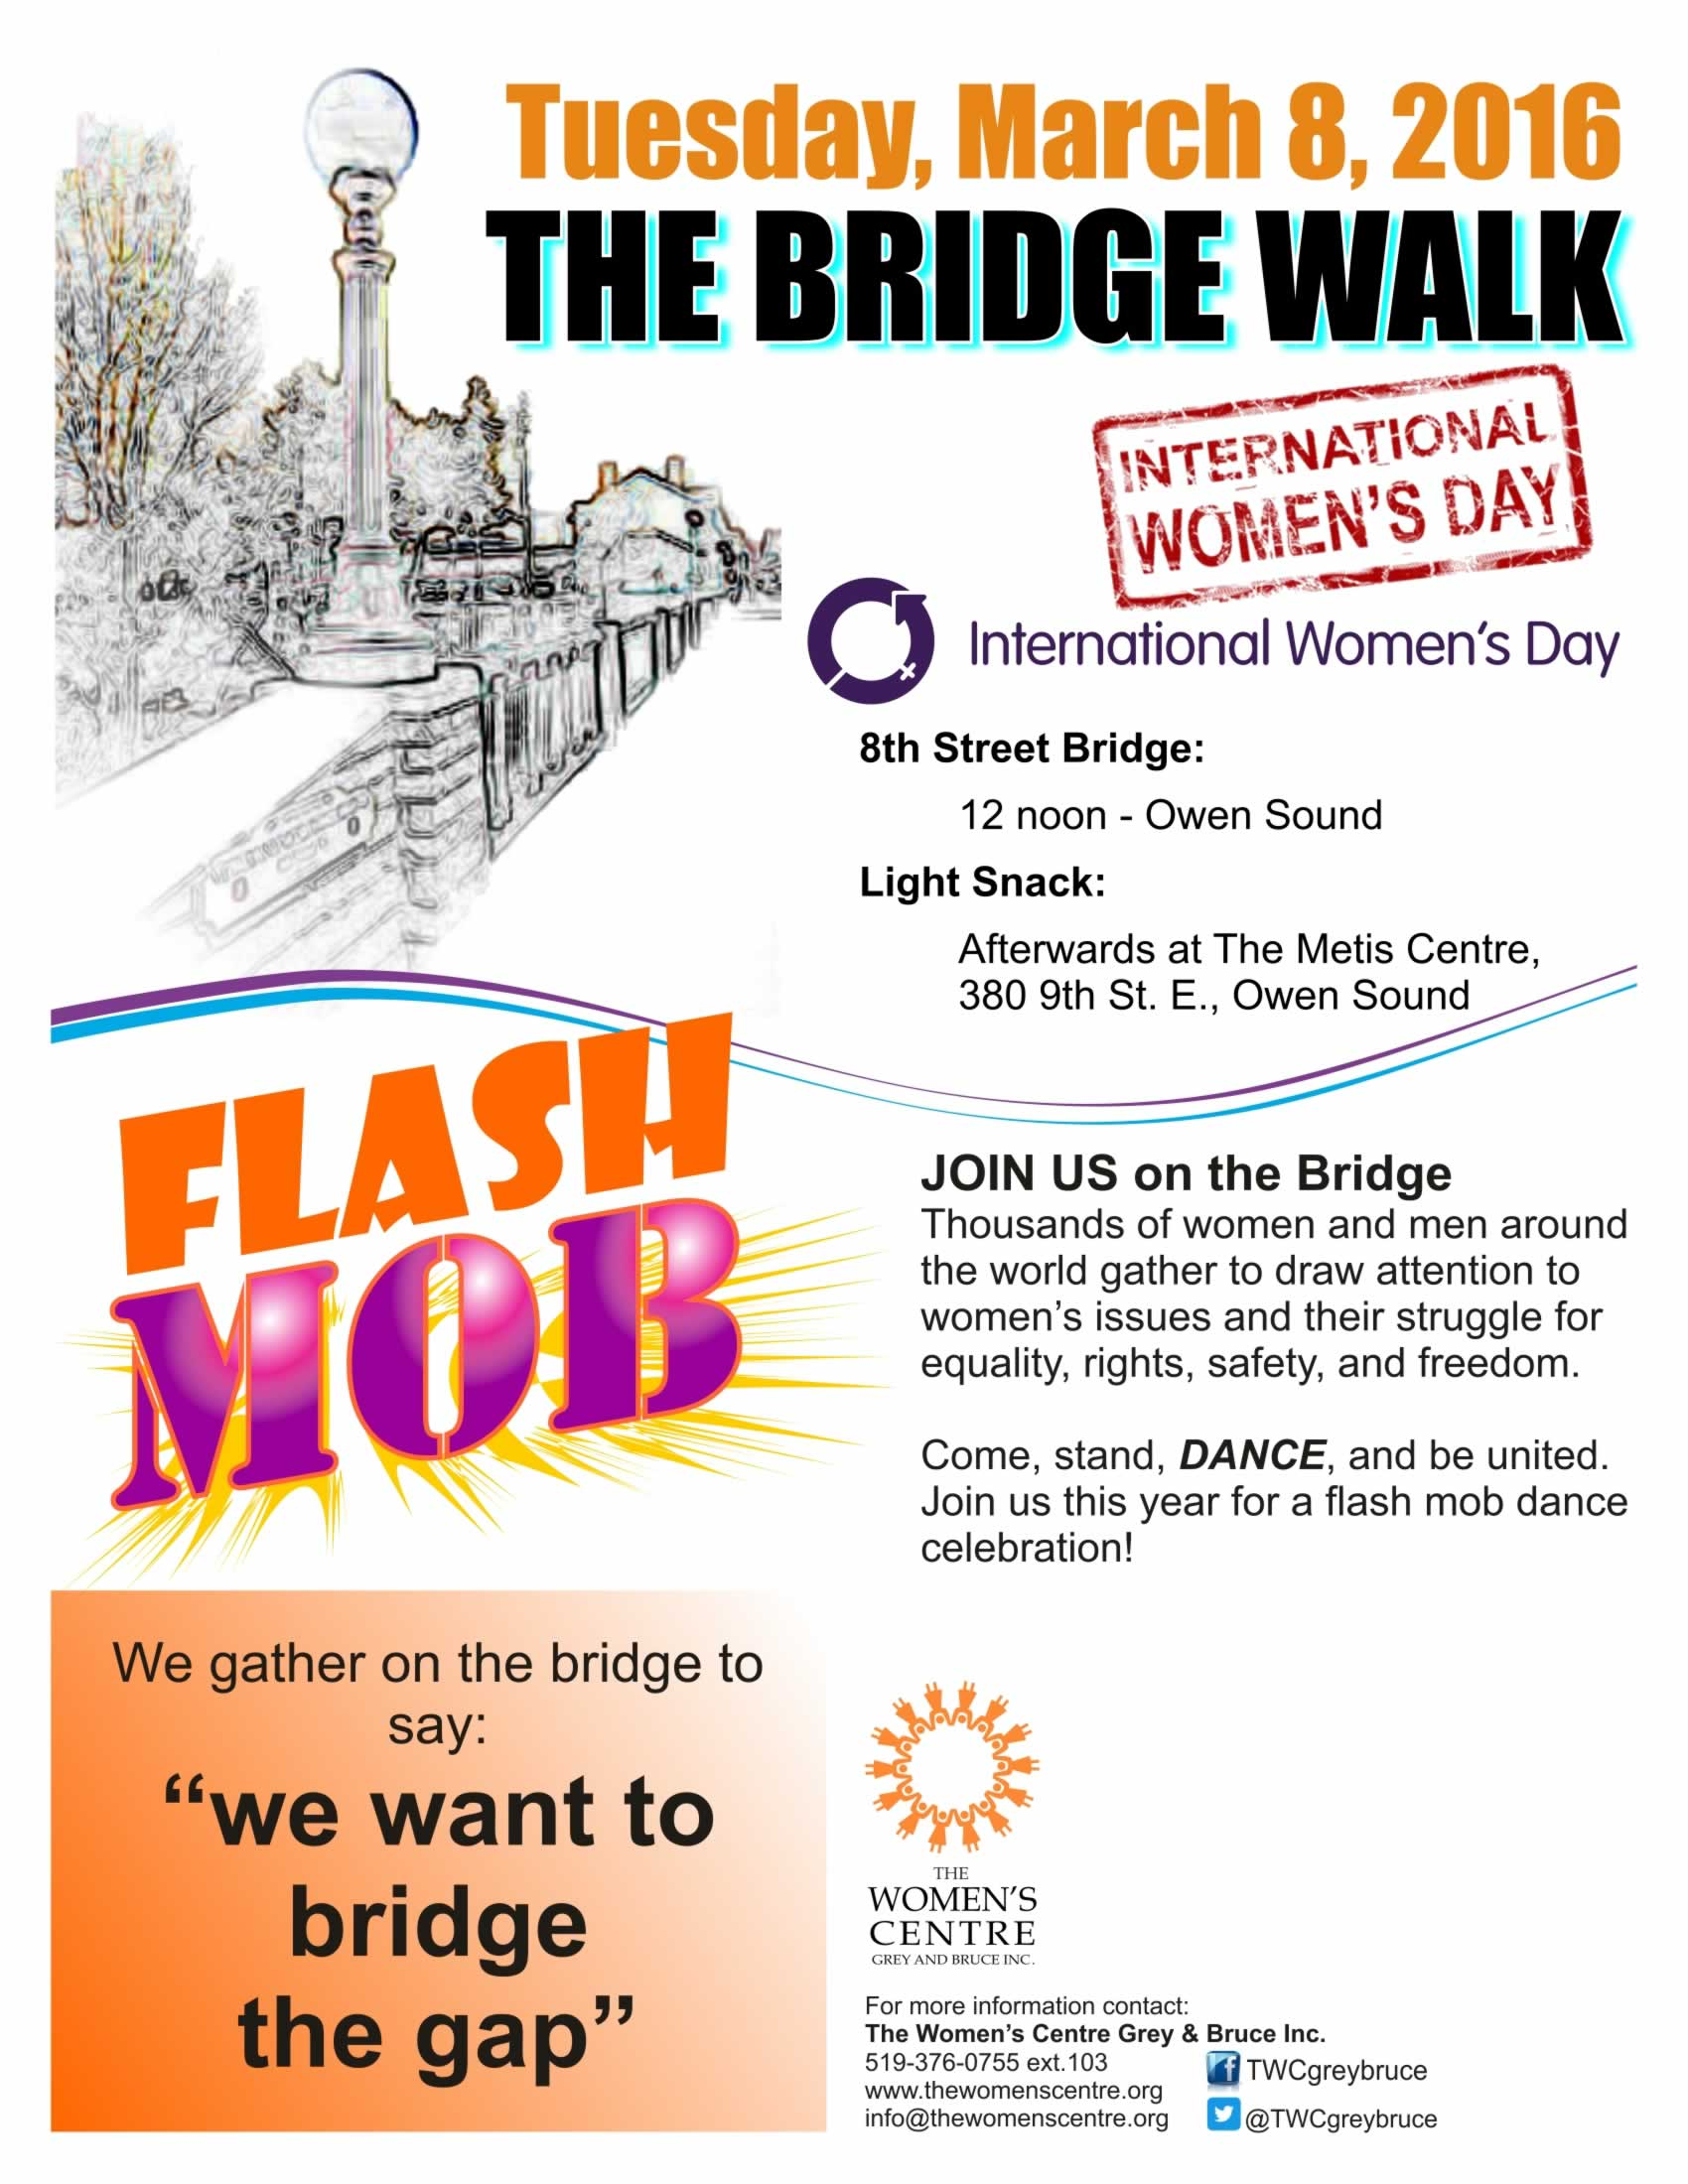 iwd-bridge-poster-2016.jpg